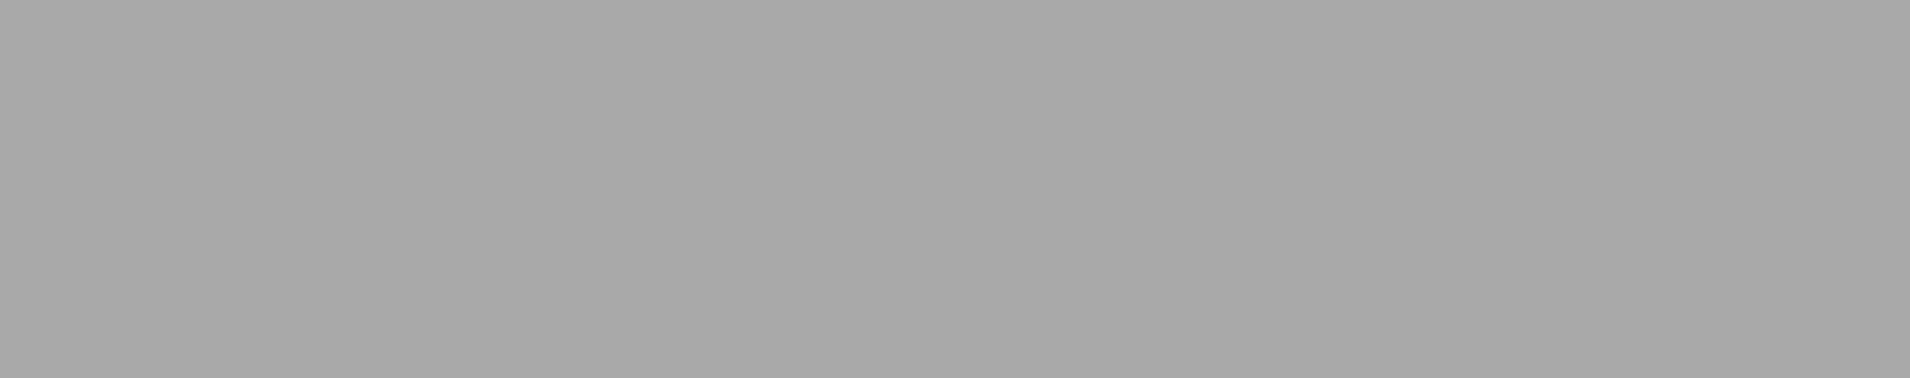 MiniLuxe-gray